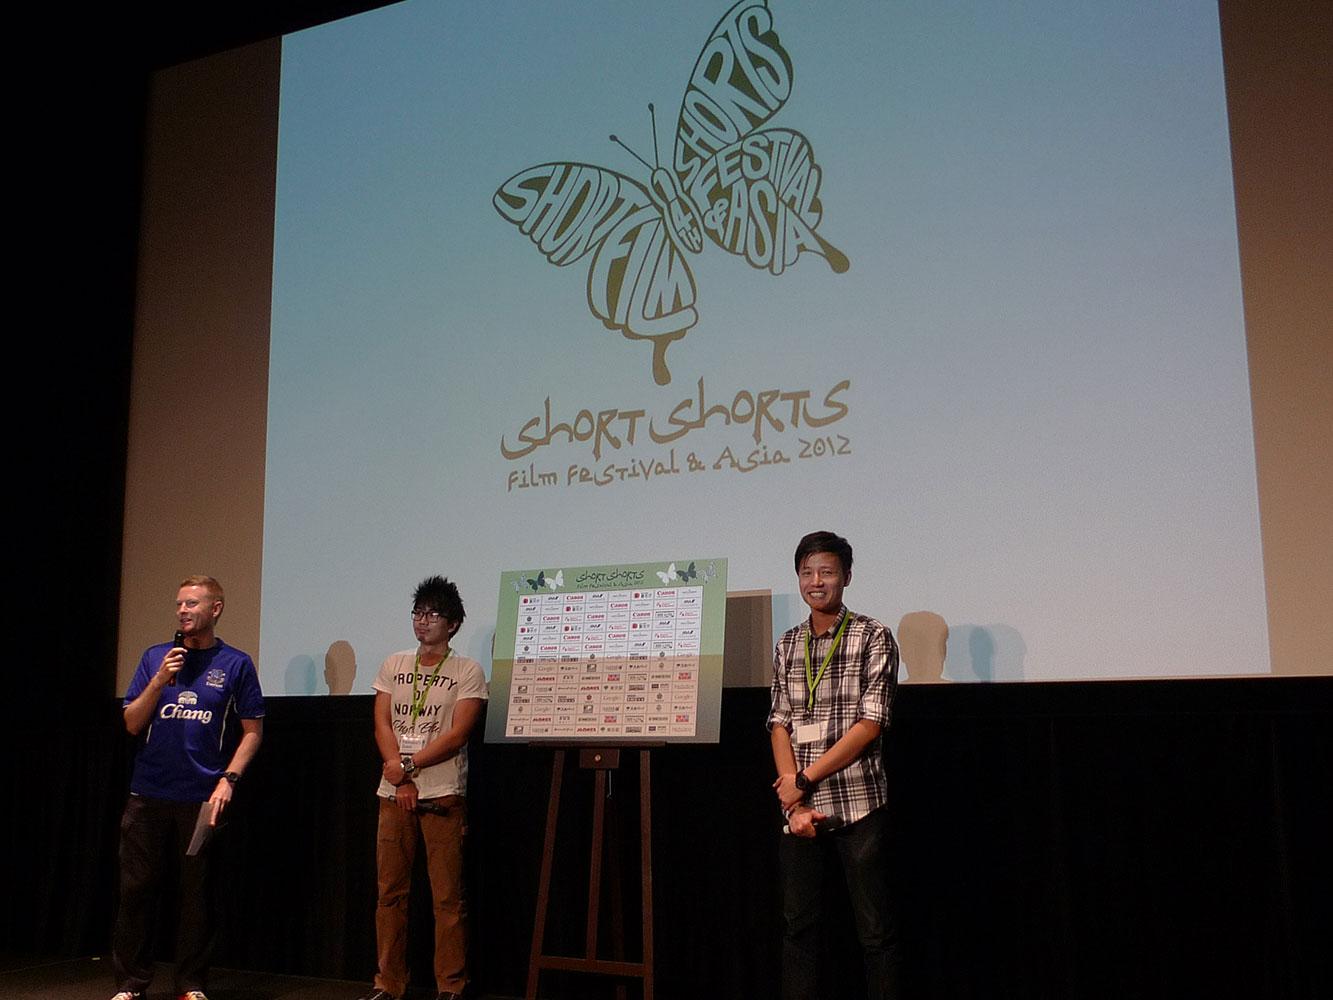 Short Shorts Film Festival Asia (JAPAN)